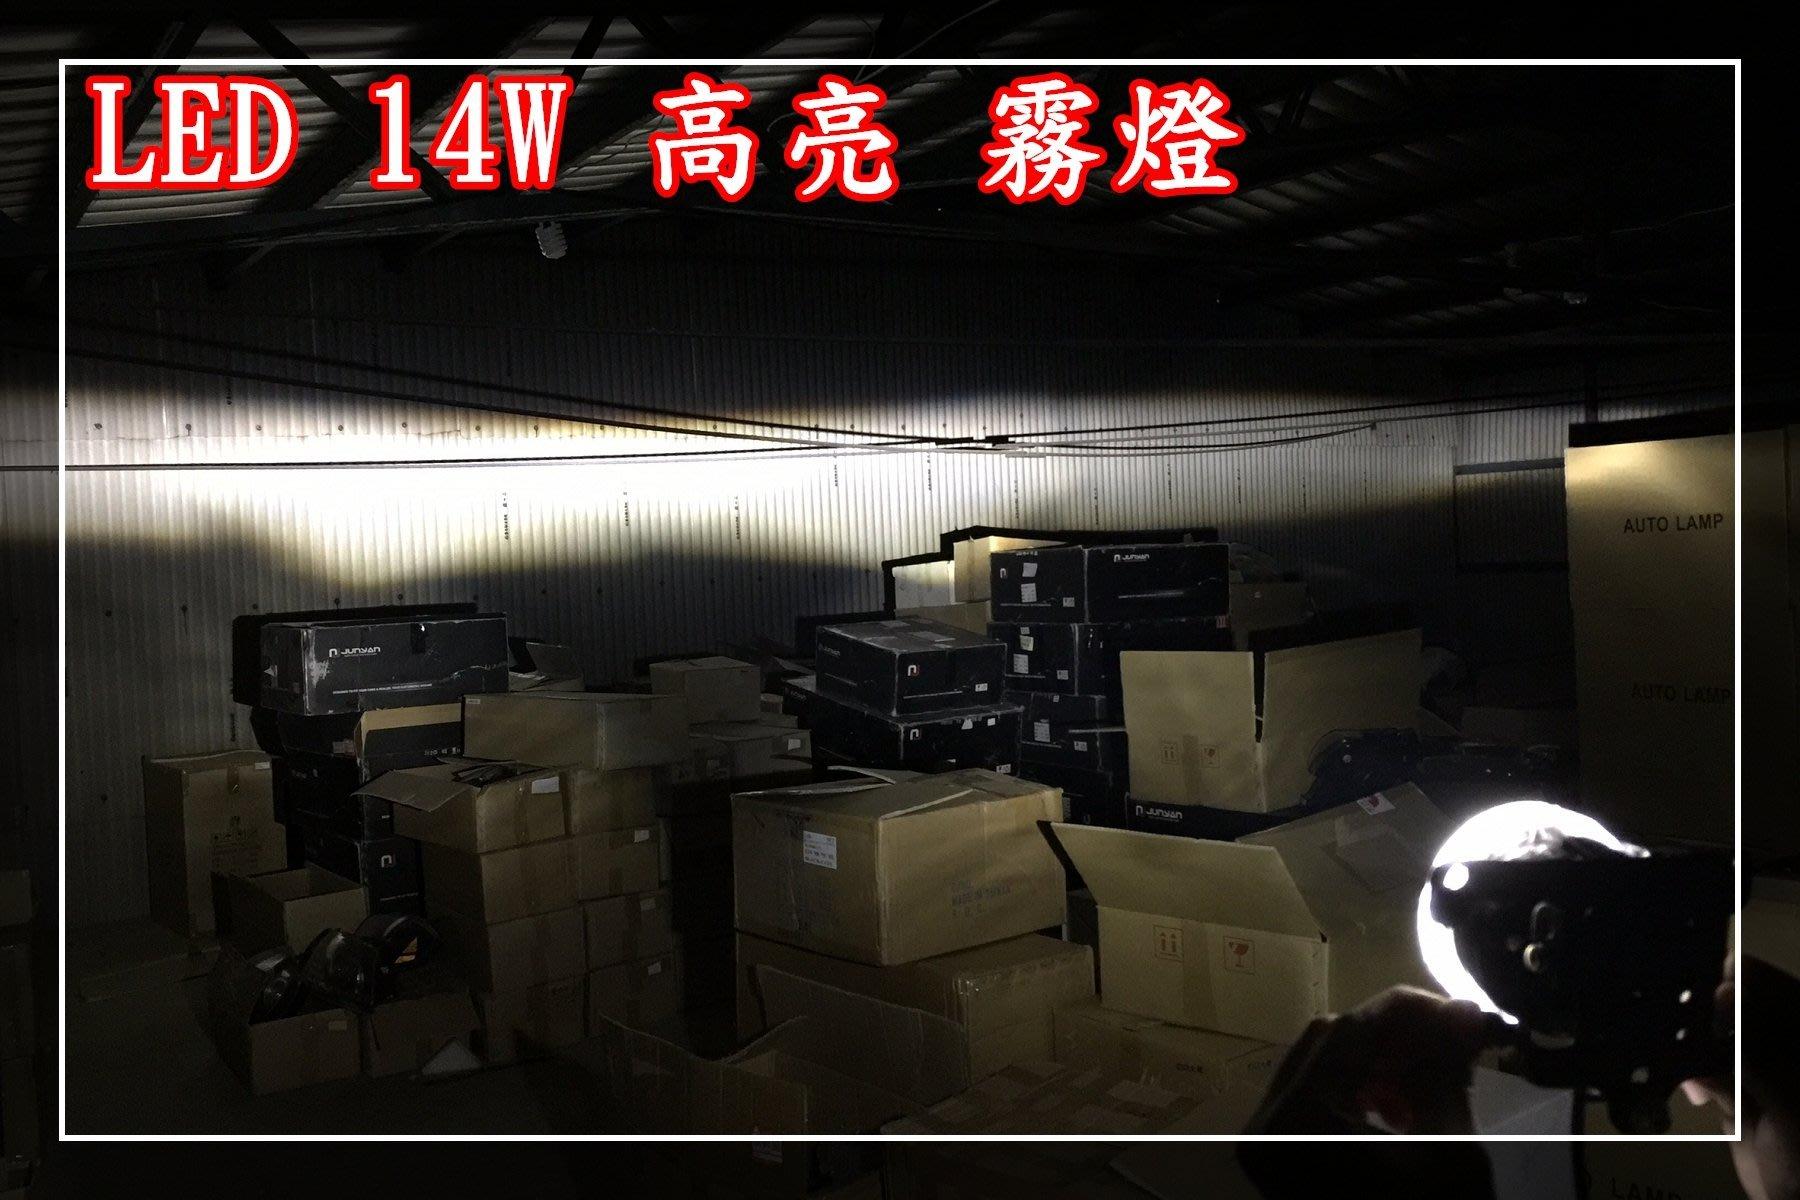 【炬霸科技】14W LED 光圈 防水 霧燈 魚眼 高亮 YARIS PREVIA SIENNA IS250 CT200